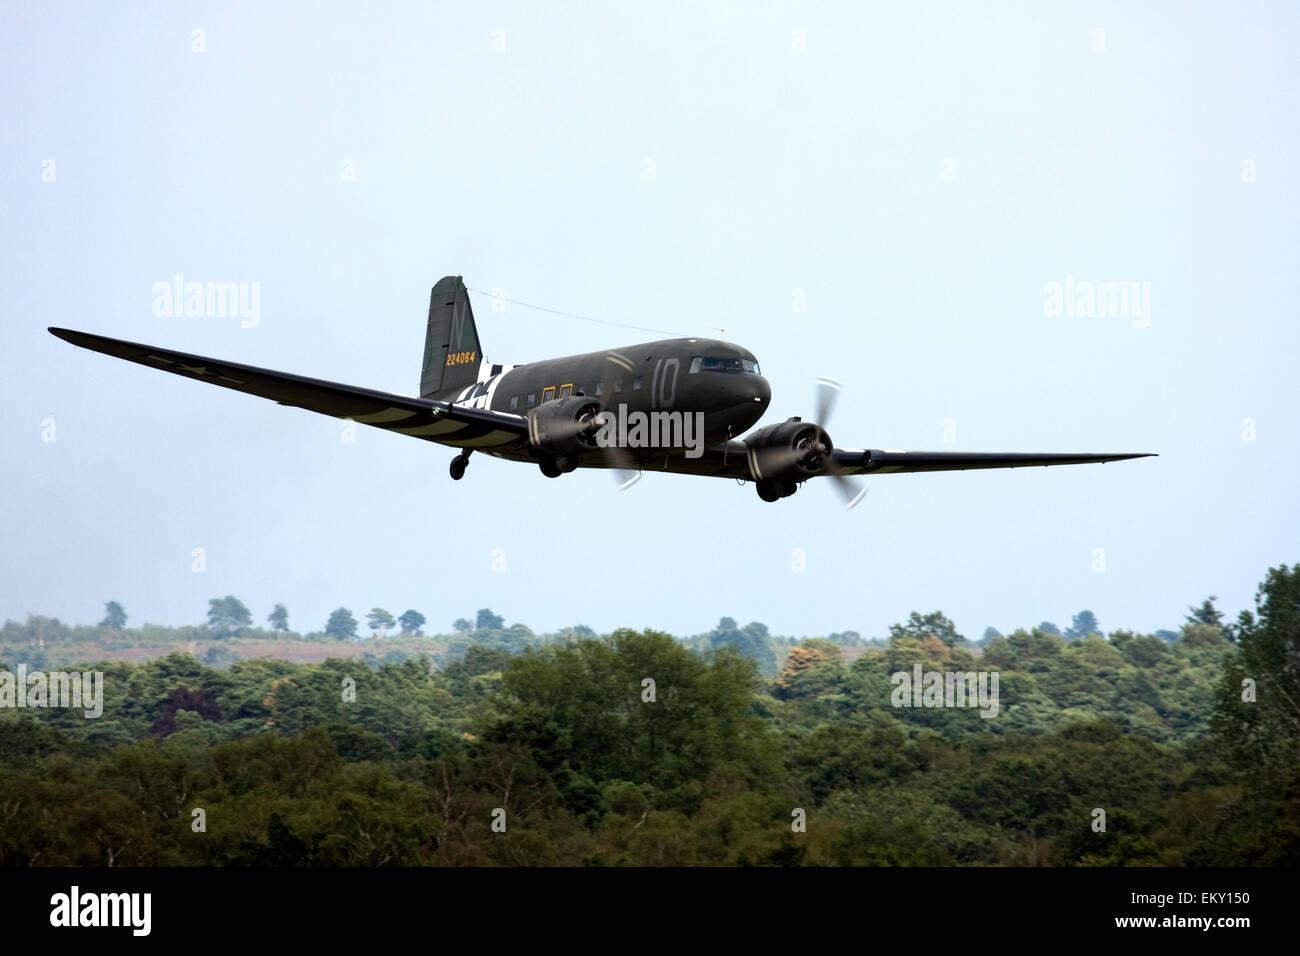 Douglas C-47A Skytrain DC-3 at  Farnborough International Airshow 2014. - Stock Image